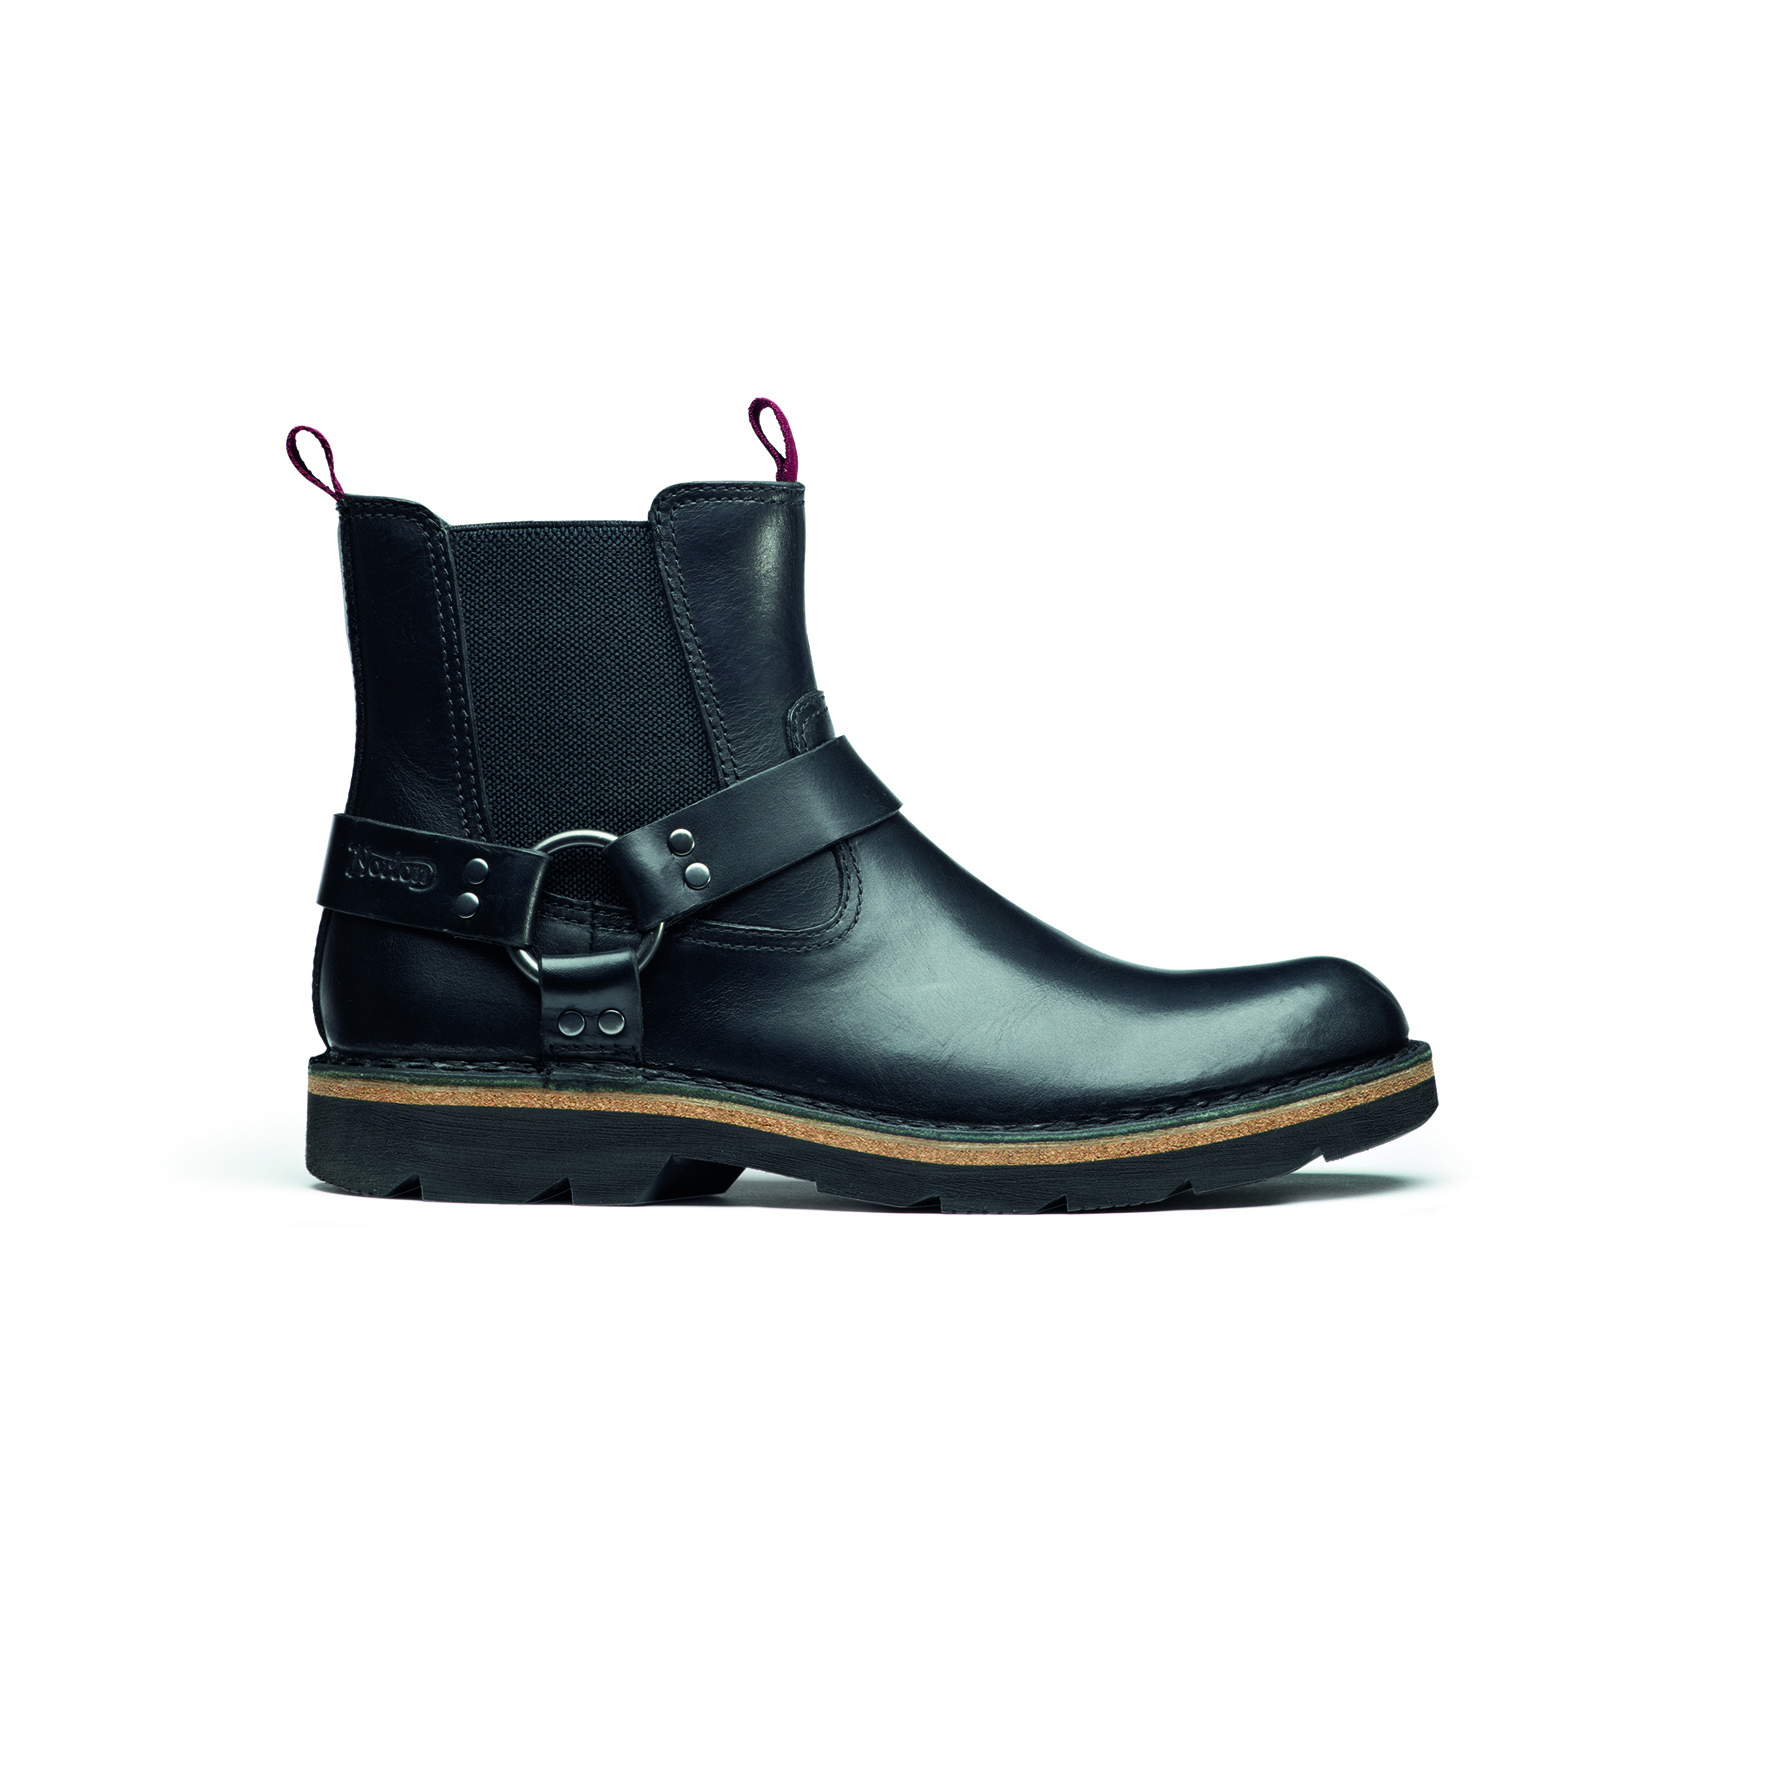 Winter 2014 Black Leather Shoes Zapatos Clarks Invierno Men